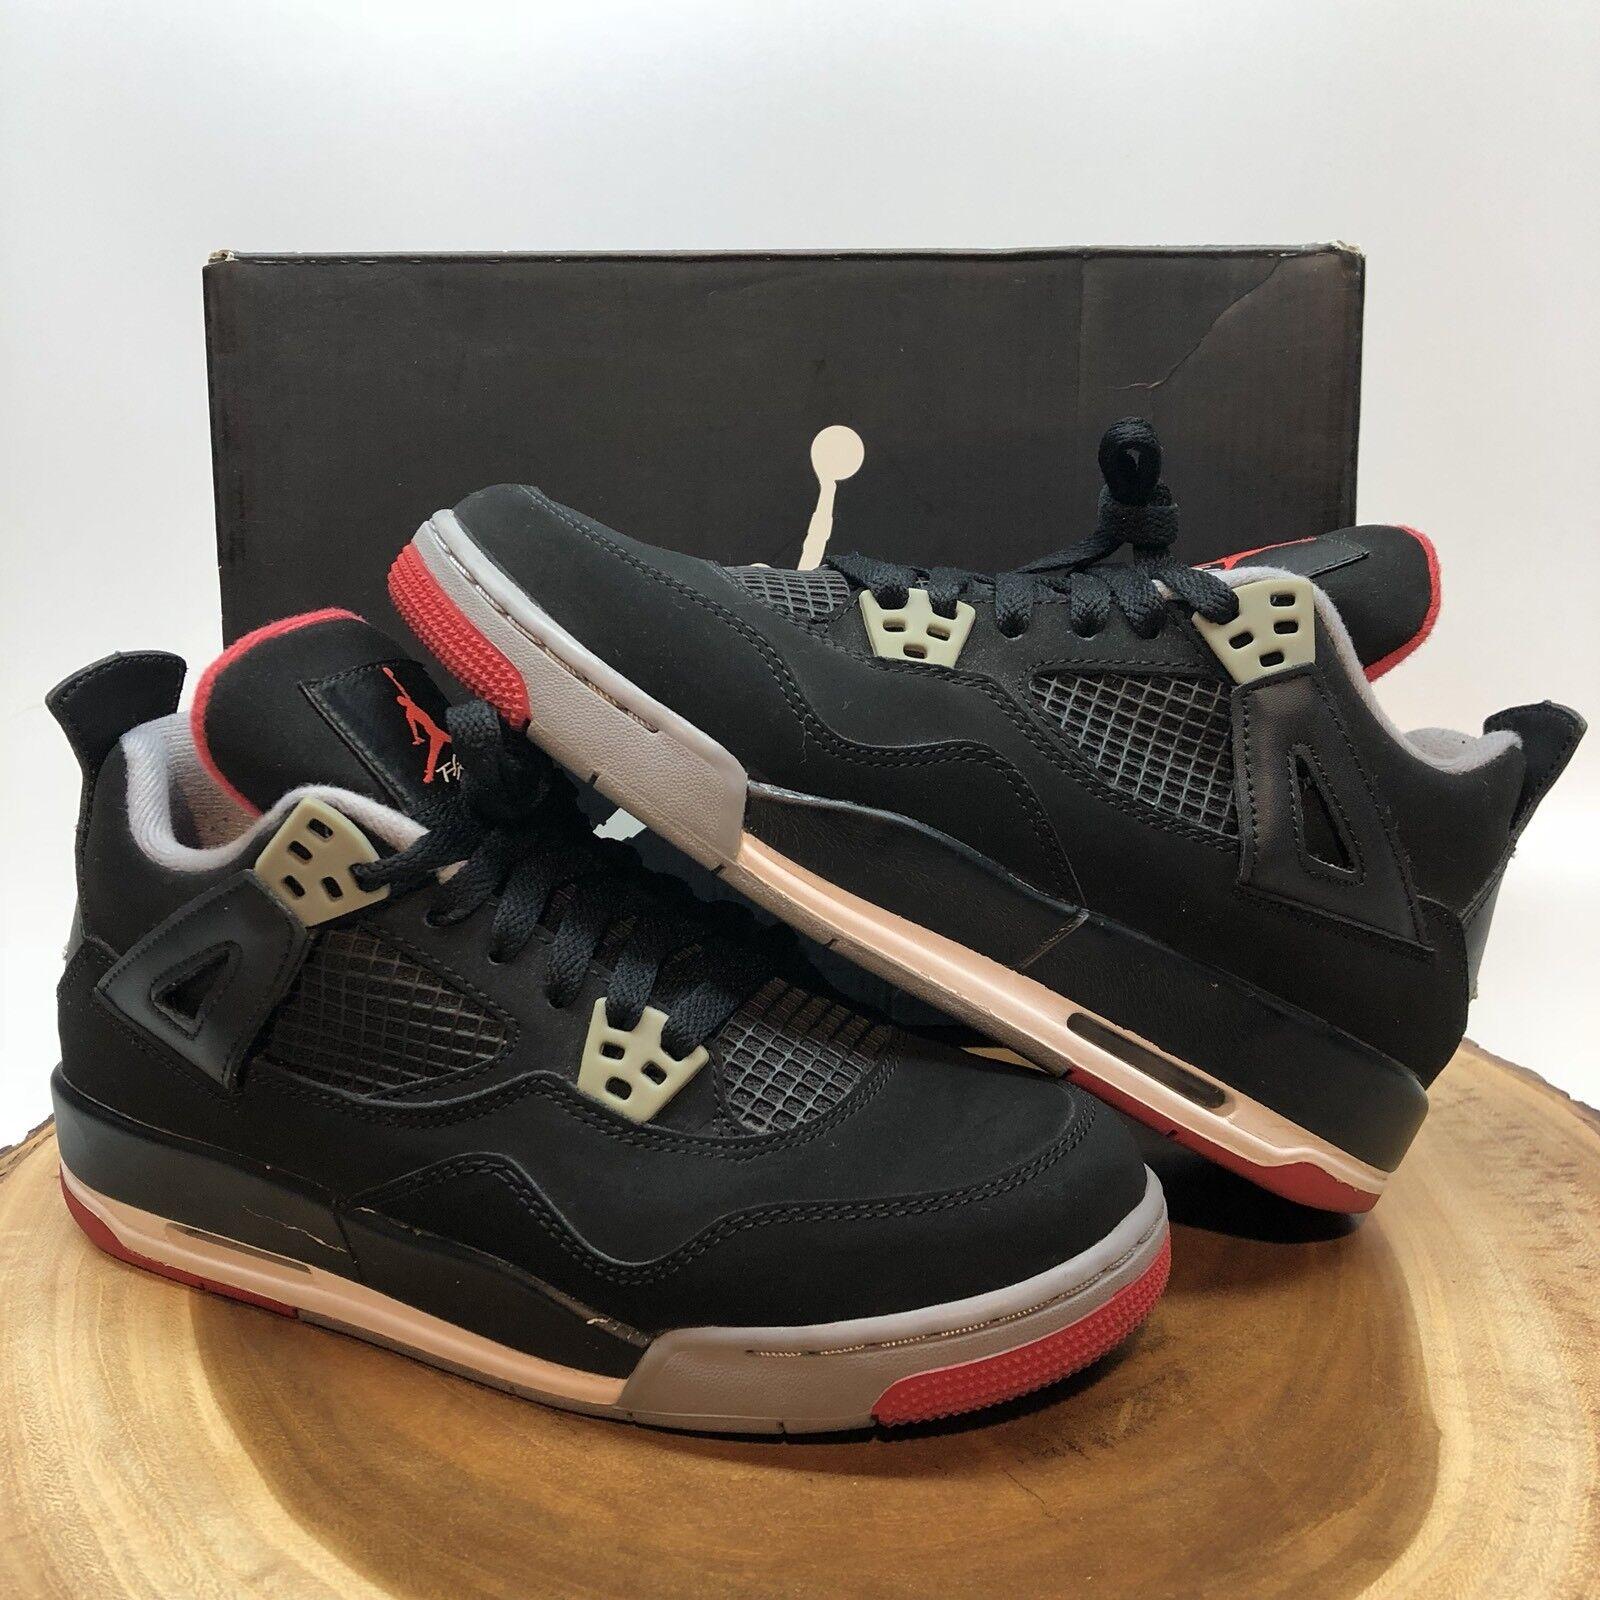 Nike Air Jordan Retro IV Bred Comfortable best-selling model of the brand